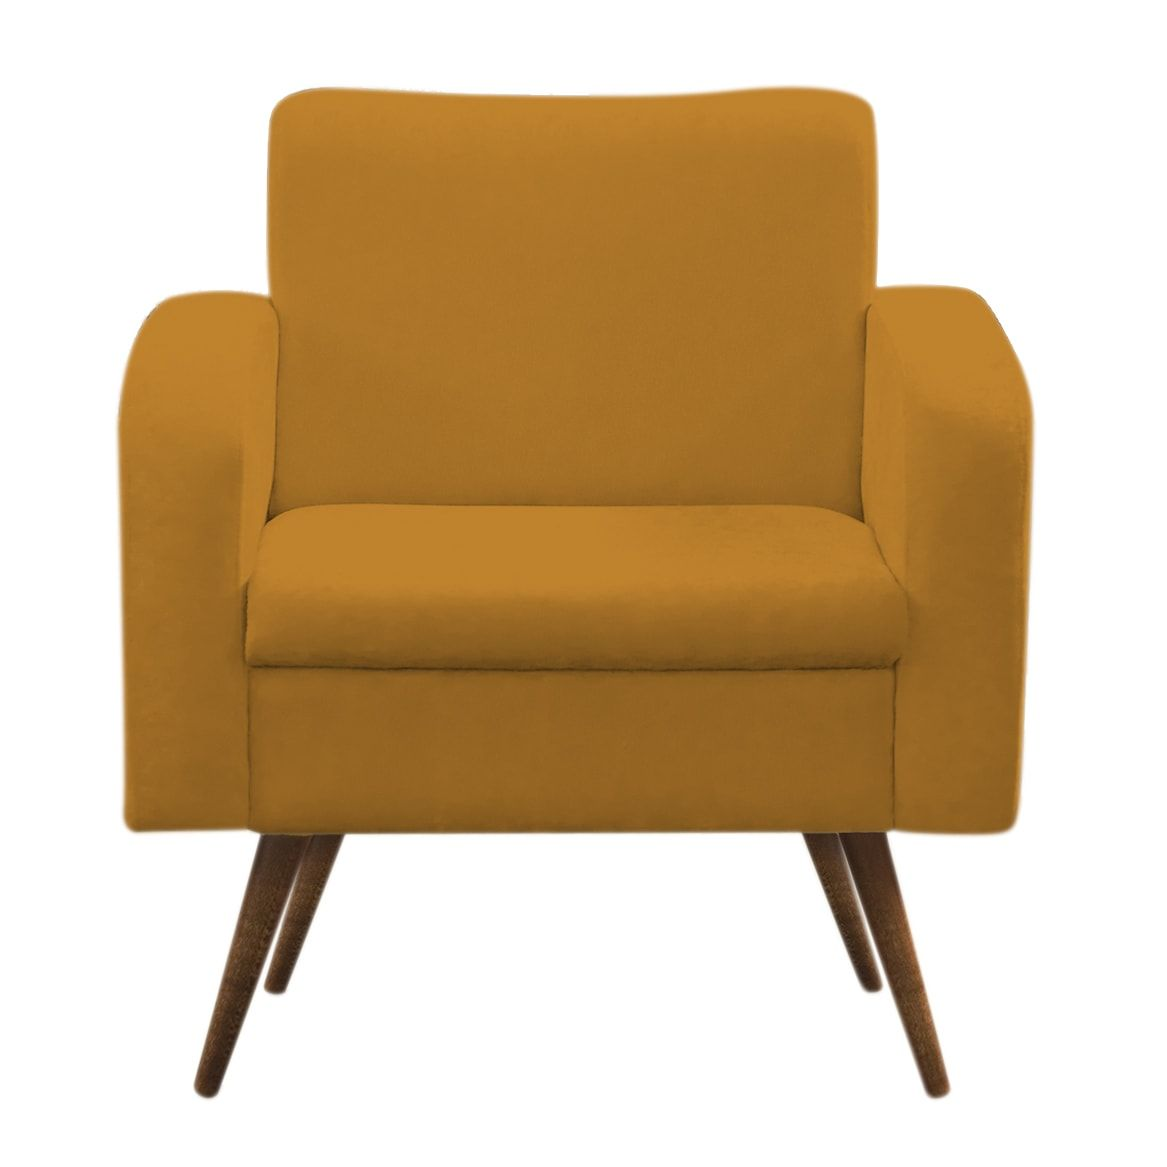 Poltrona Decorativa  Jade Amarelo Pés Palito